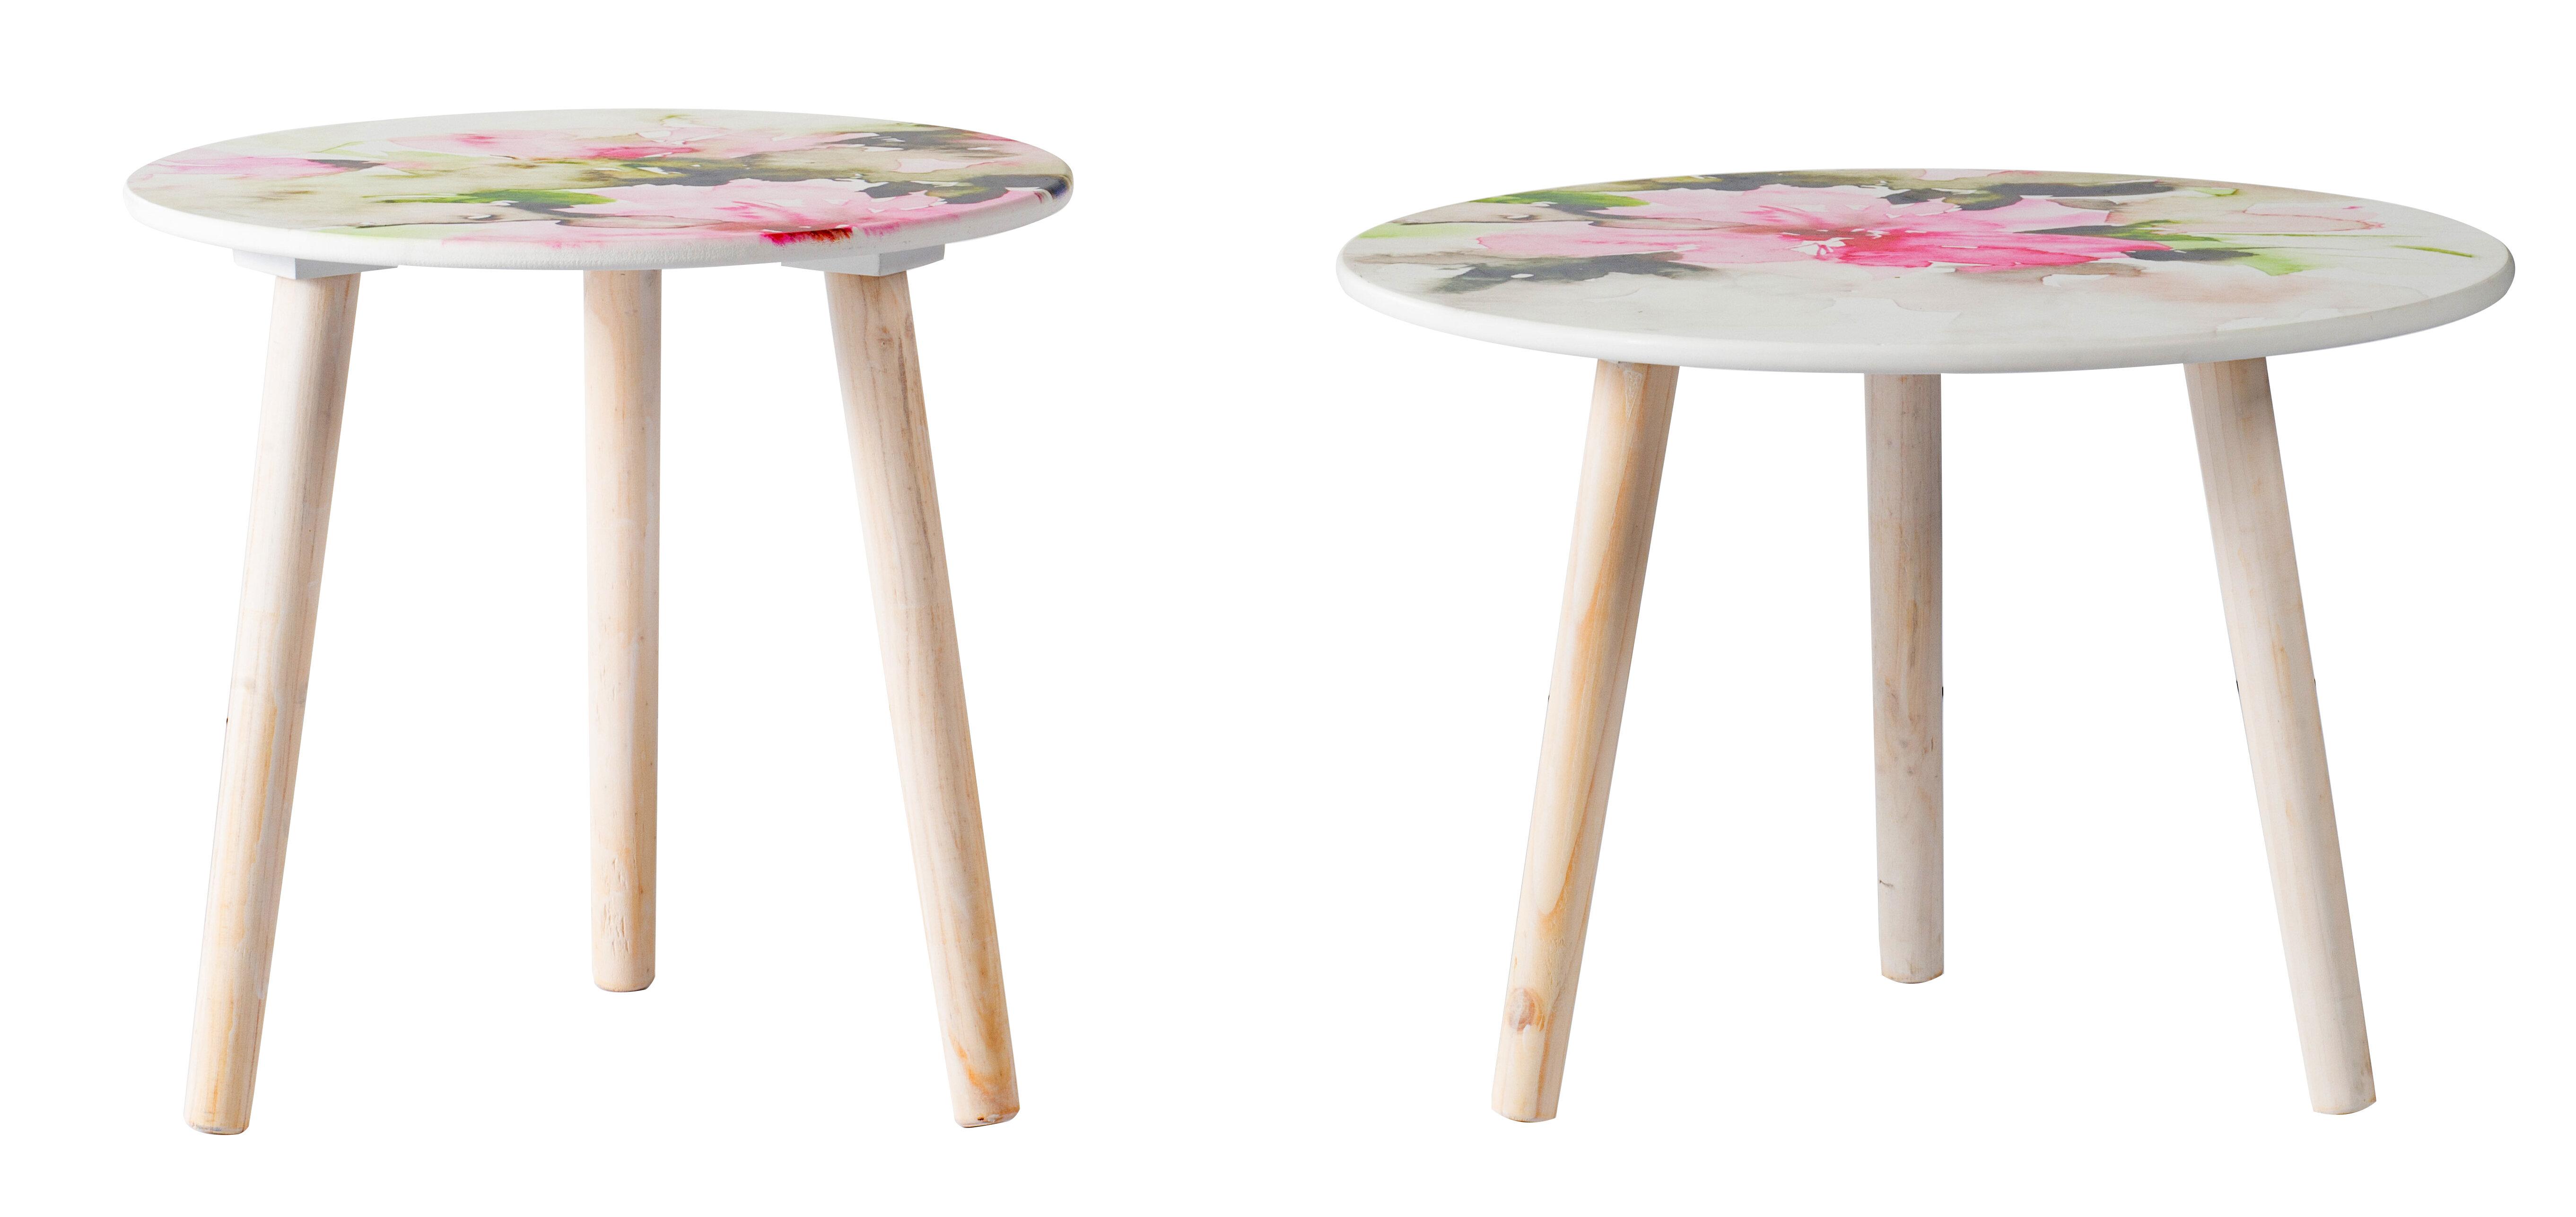 Corrigan Studio Laudalino 3 Legs End Table Set Wayfair